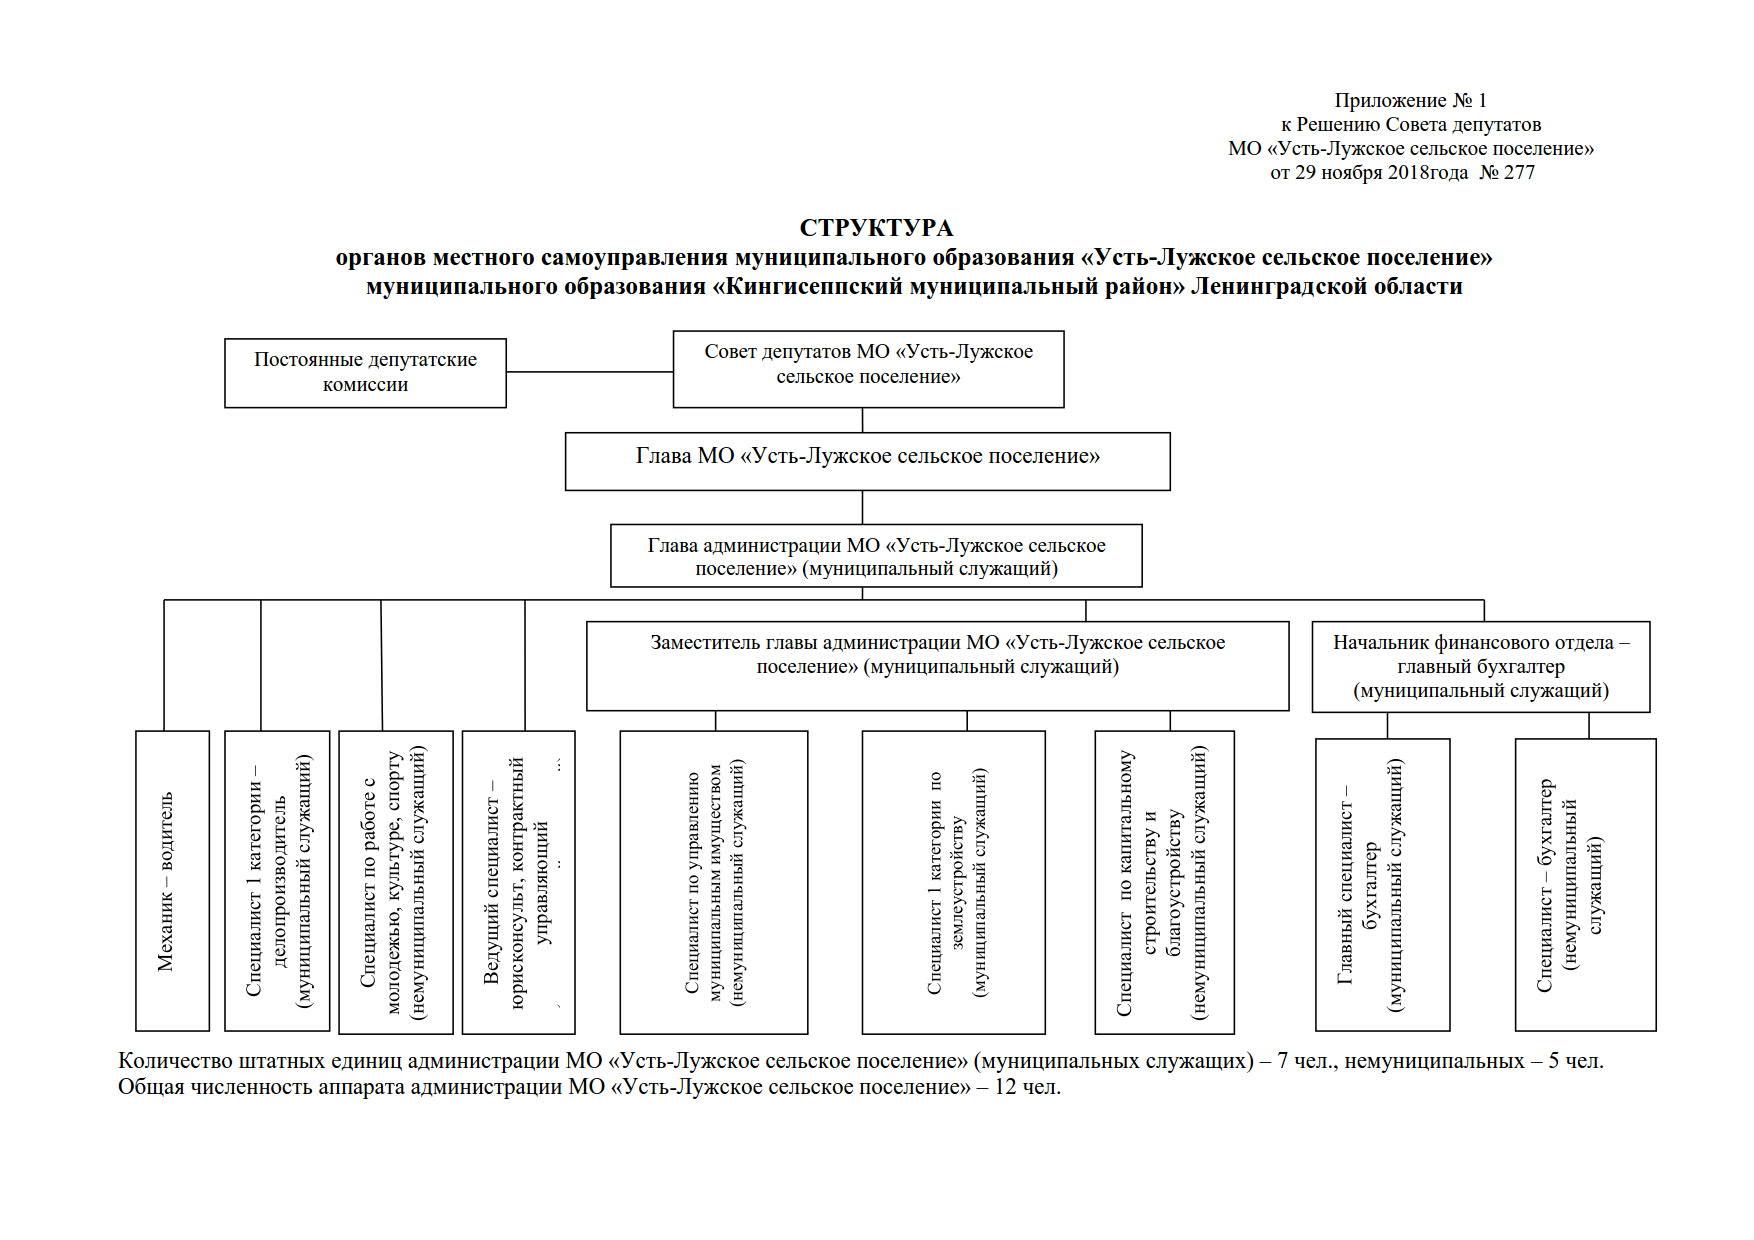 13 РСД структура администрации (2)